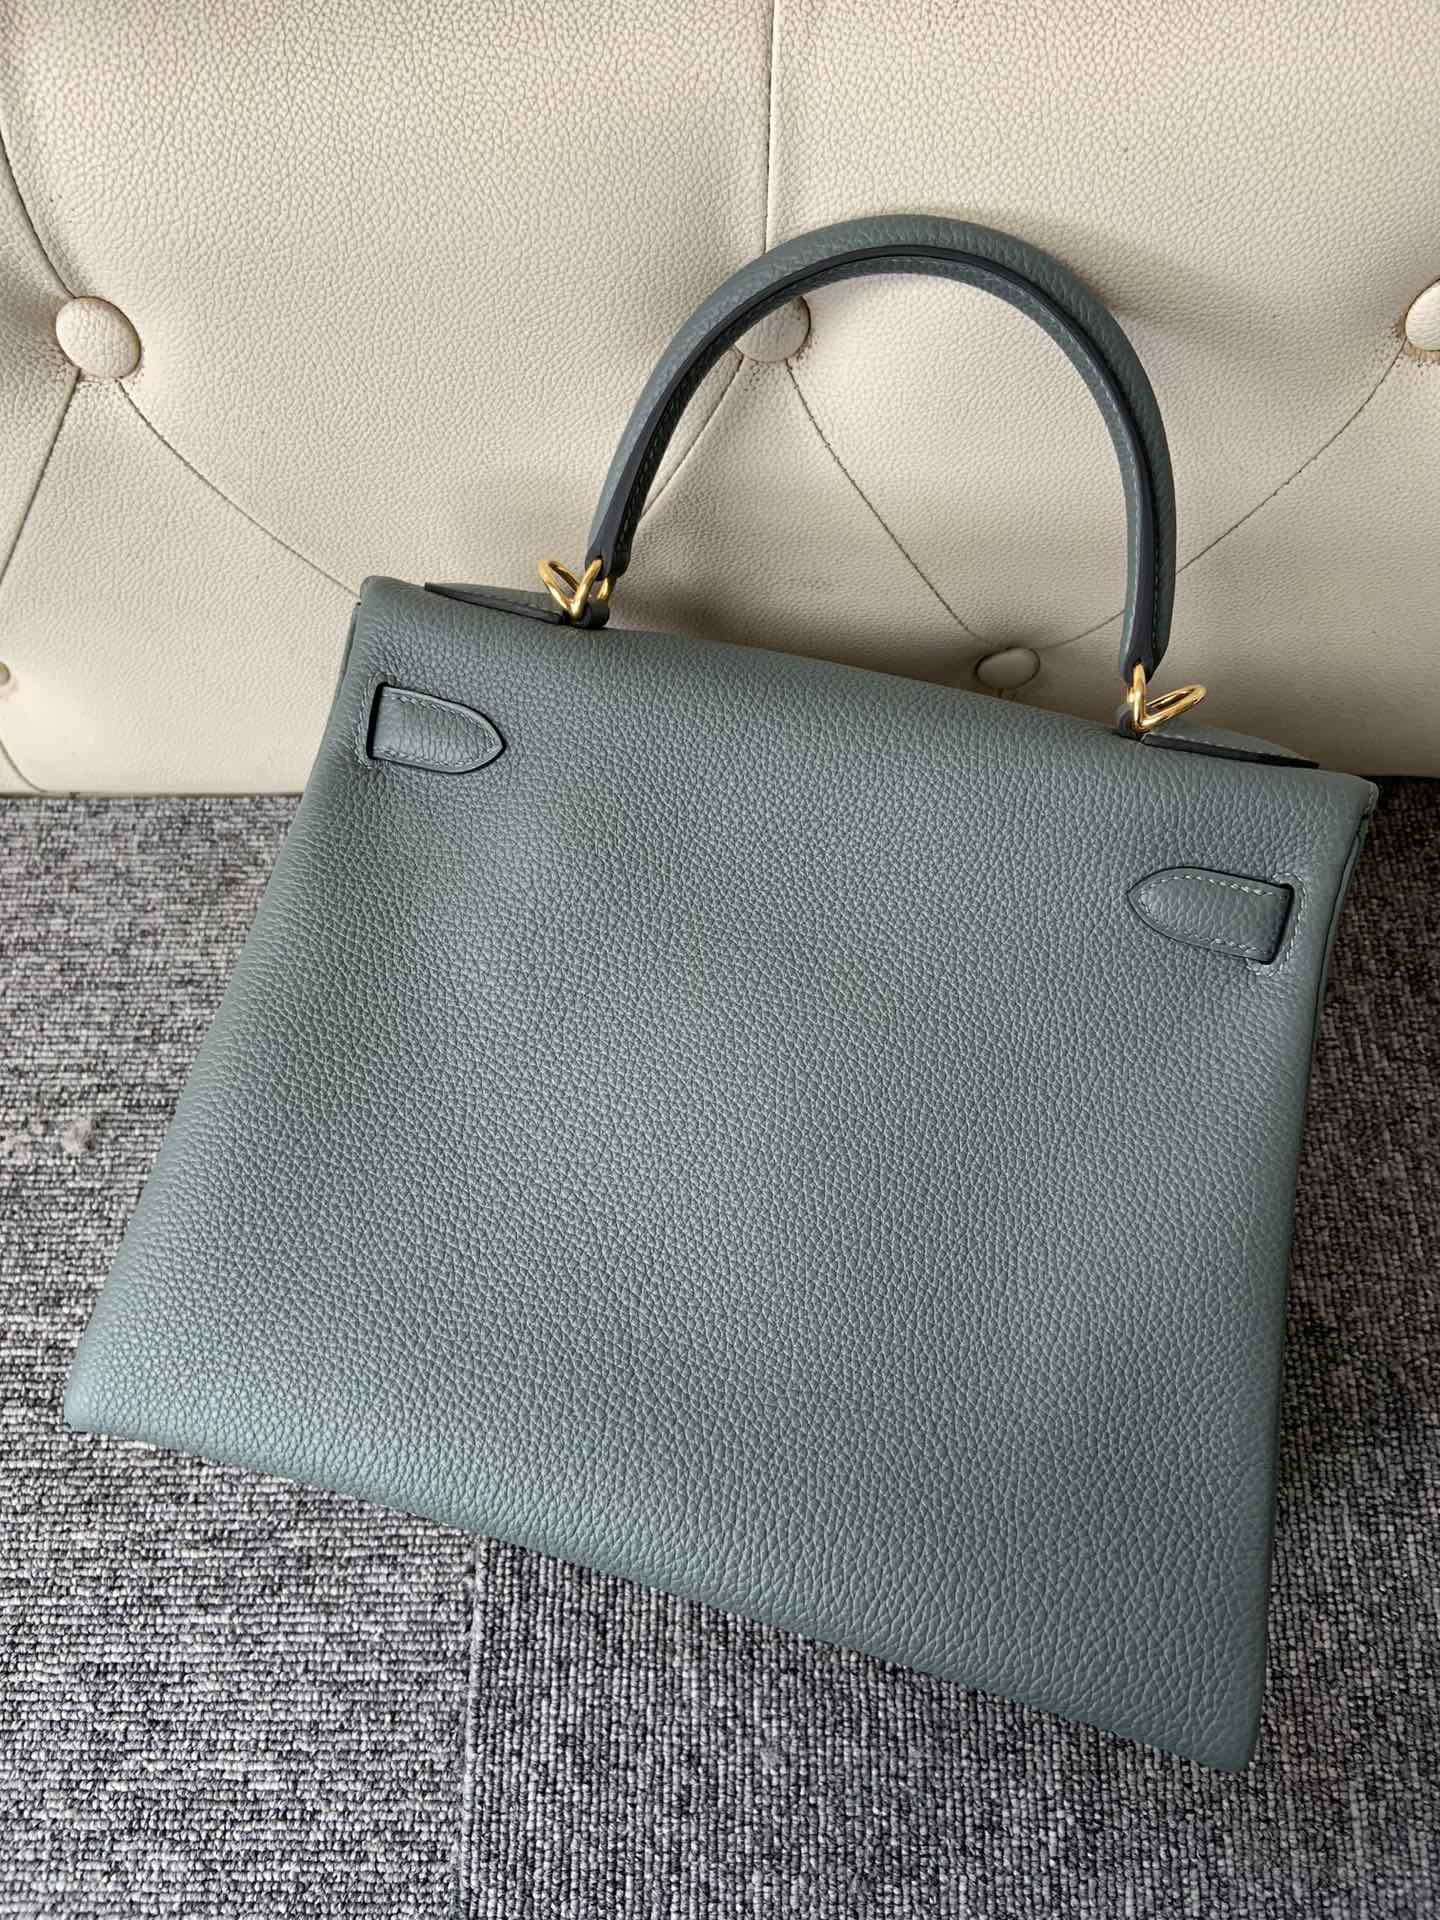 New Arrival Hermes CC63 Vert Amande Togo Calf Kelly28cm Bag Gold Hardware